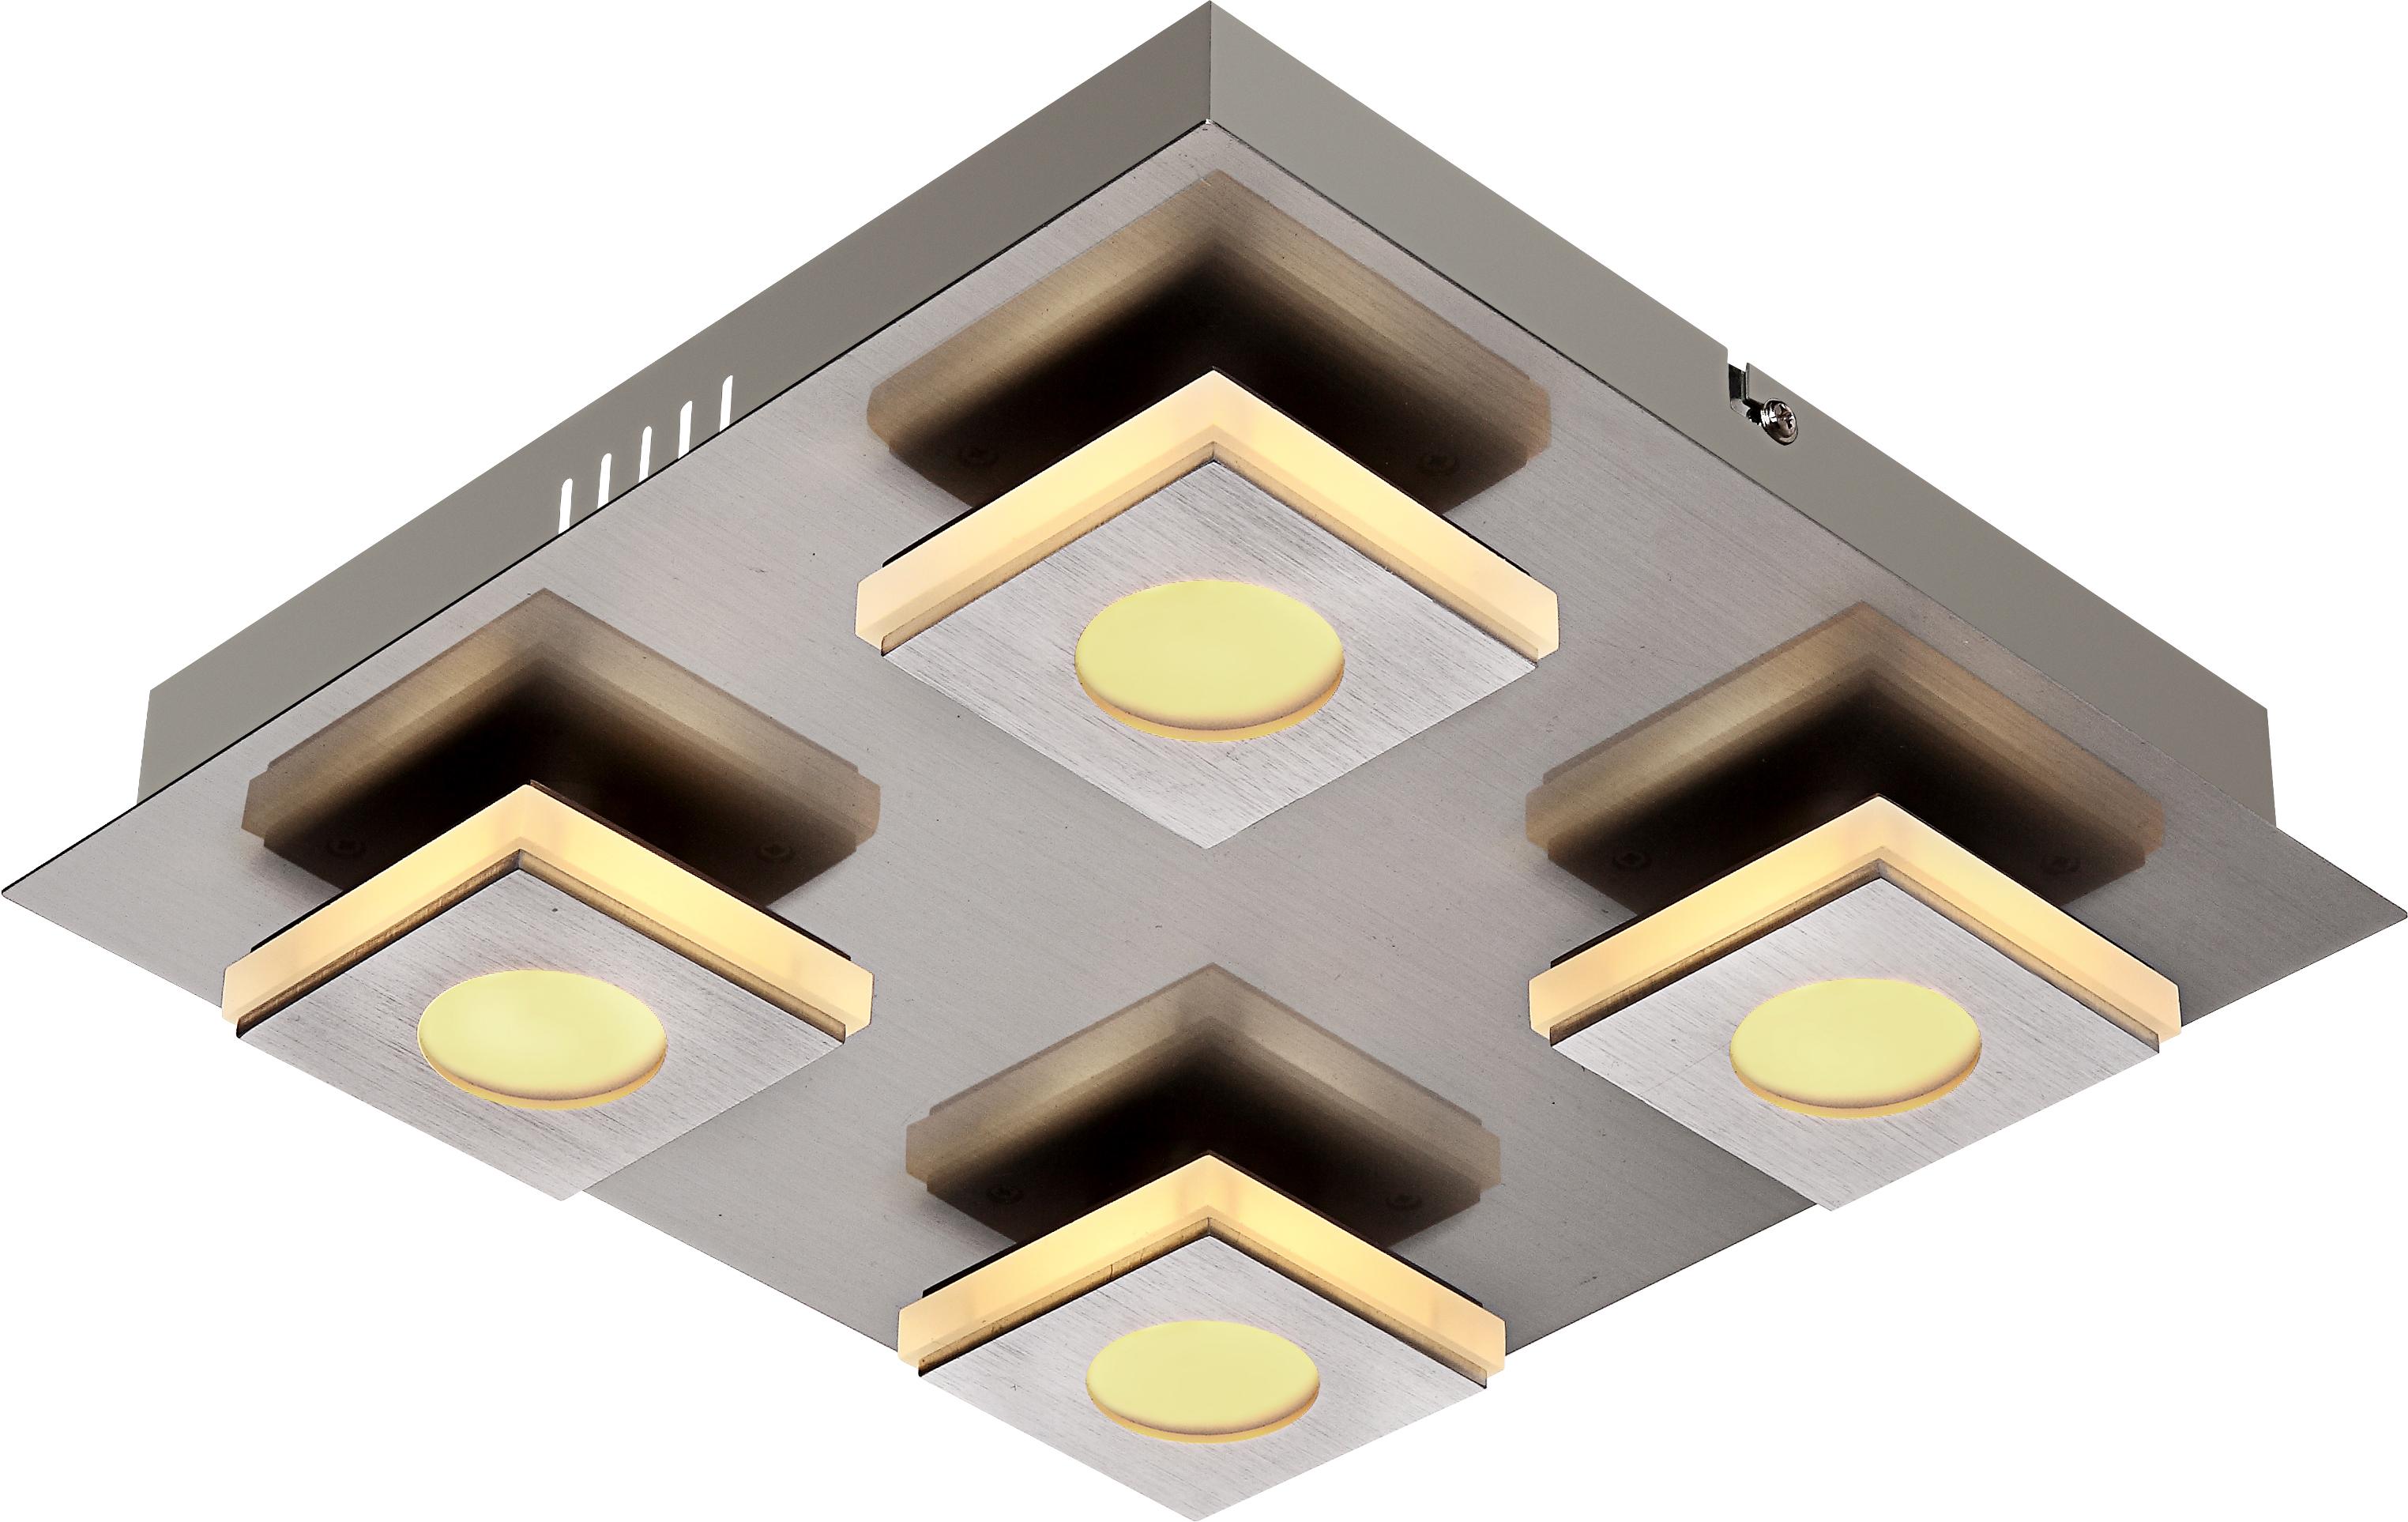 cayman schlafzimmer r ume produkte globo lighting leuchten lampen online kaufen. Black Bedroom Furniture Sets. Home Design Ideas